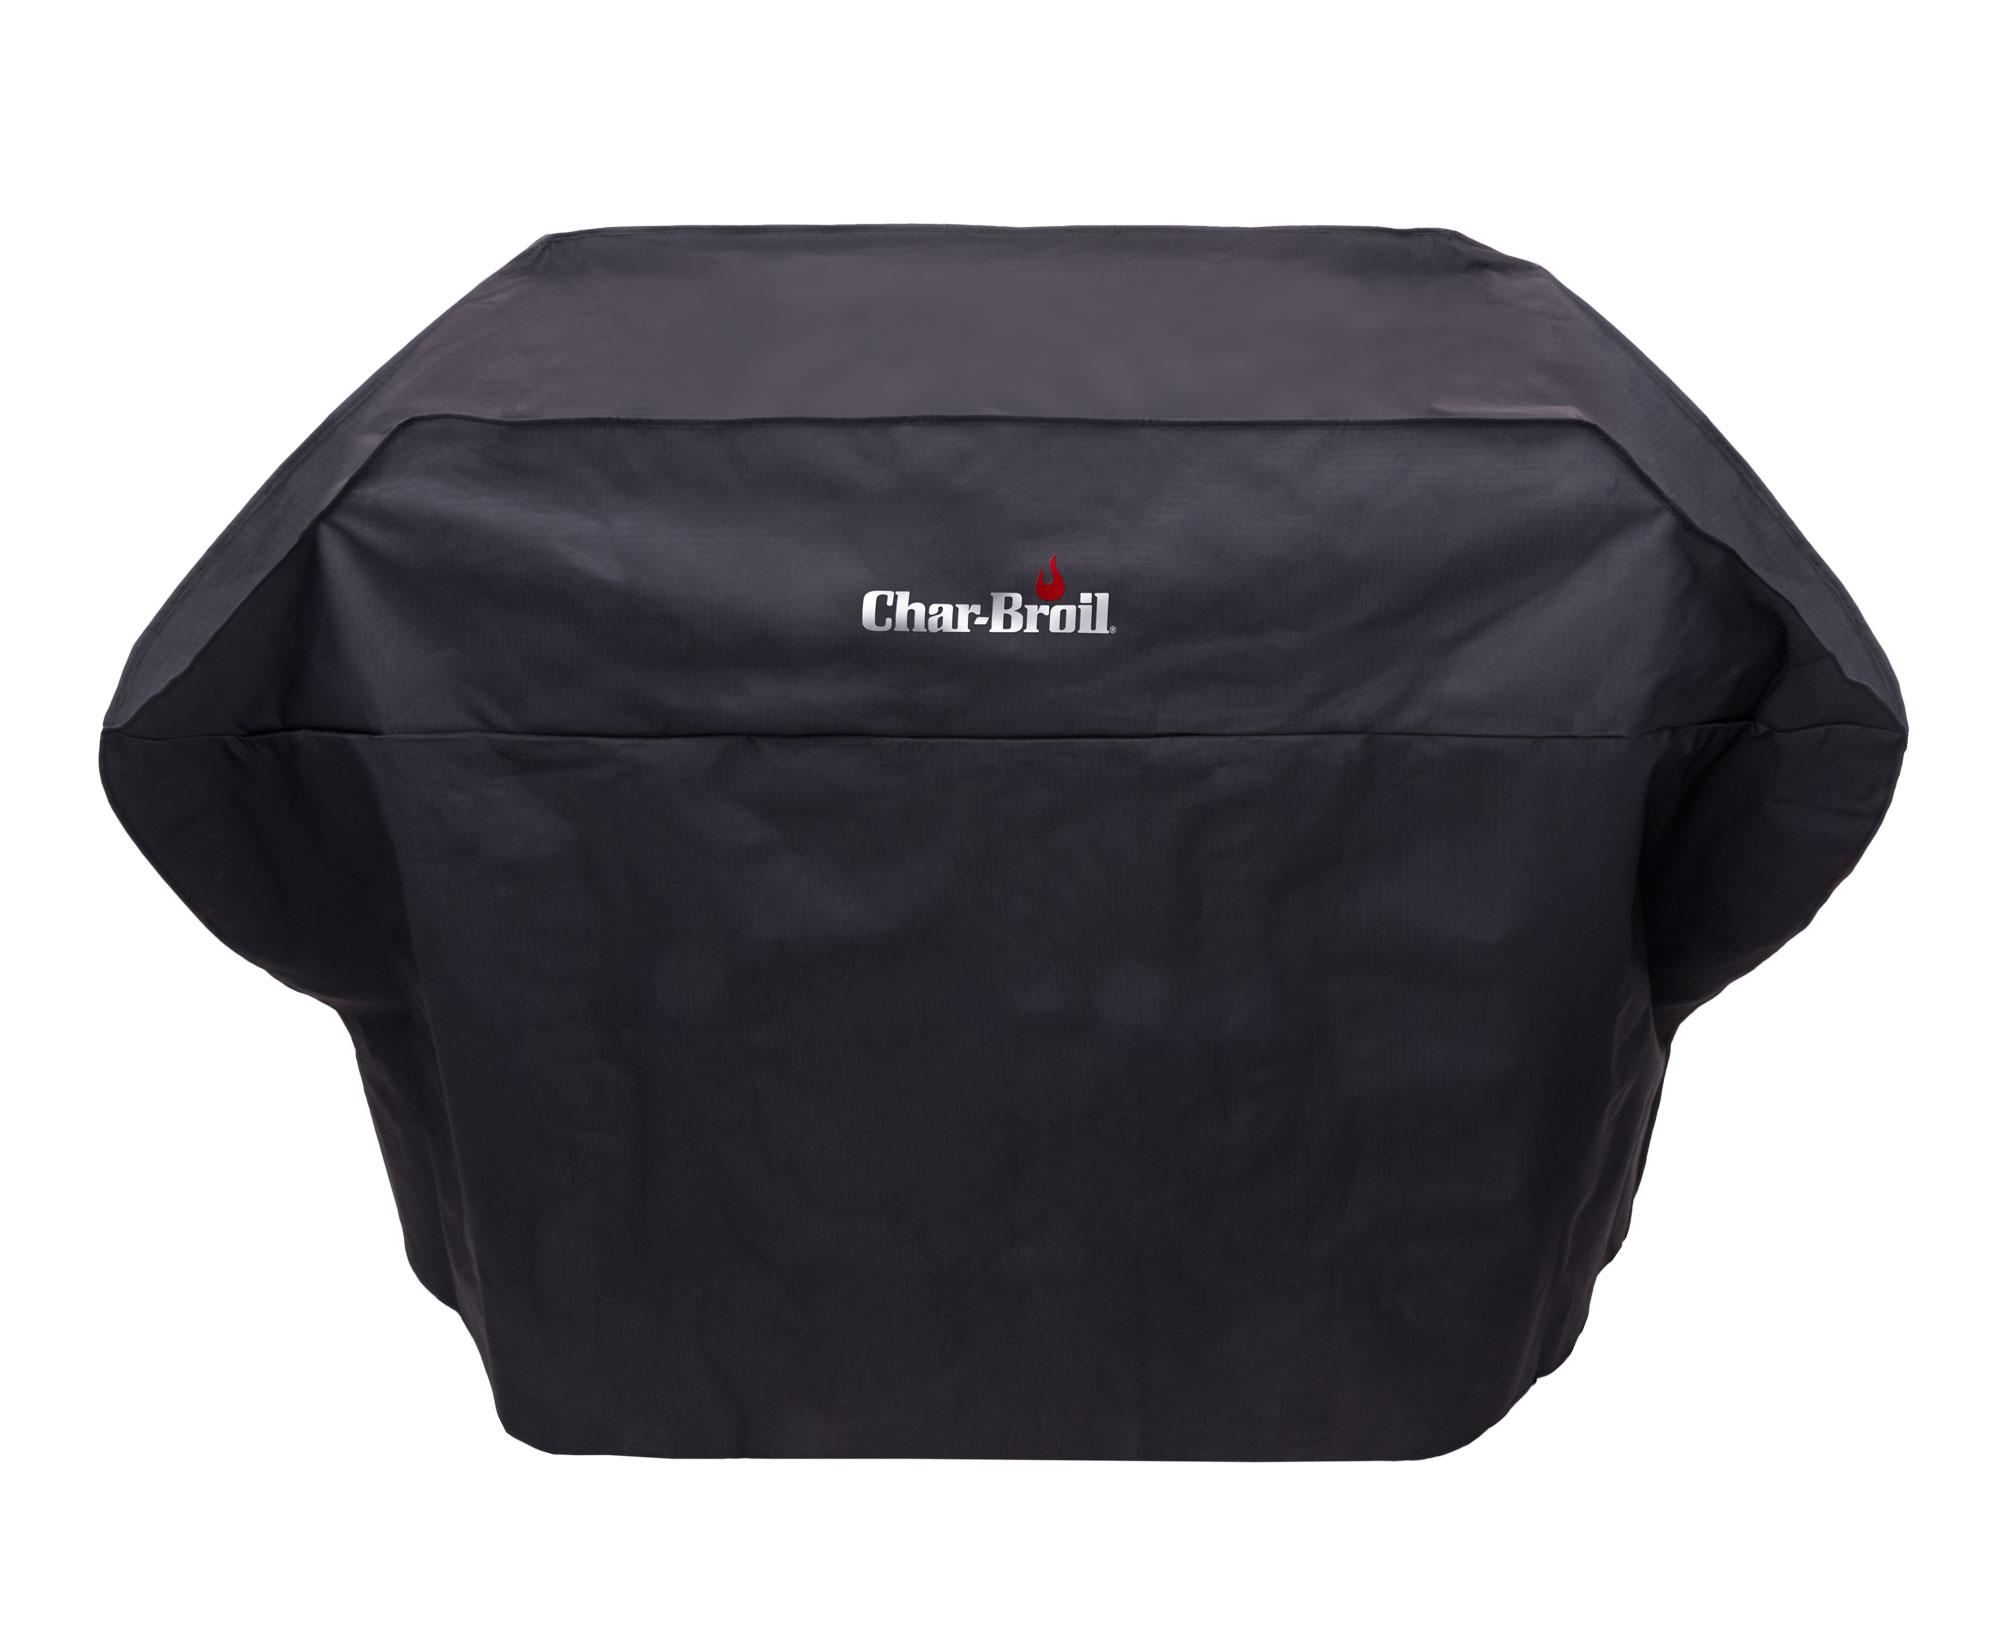 Char-Broil Schutzhülle Extrawide grill cover Bild 1